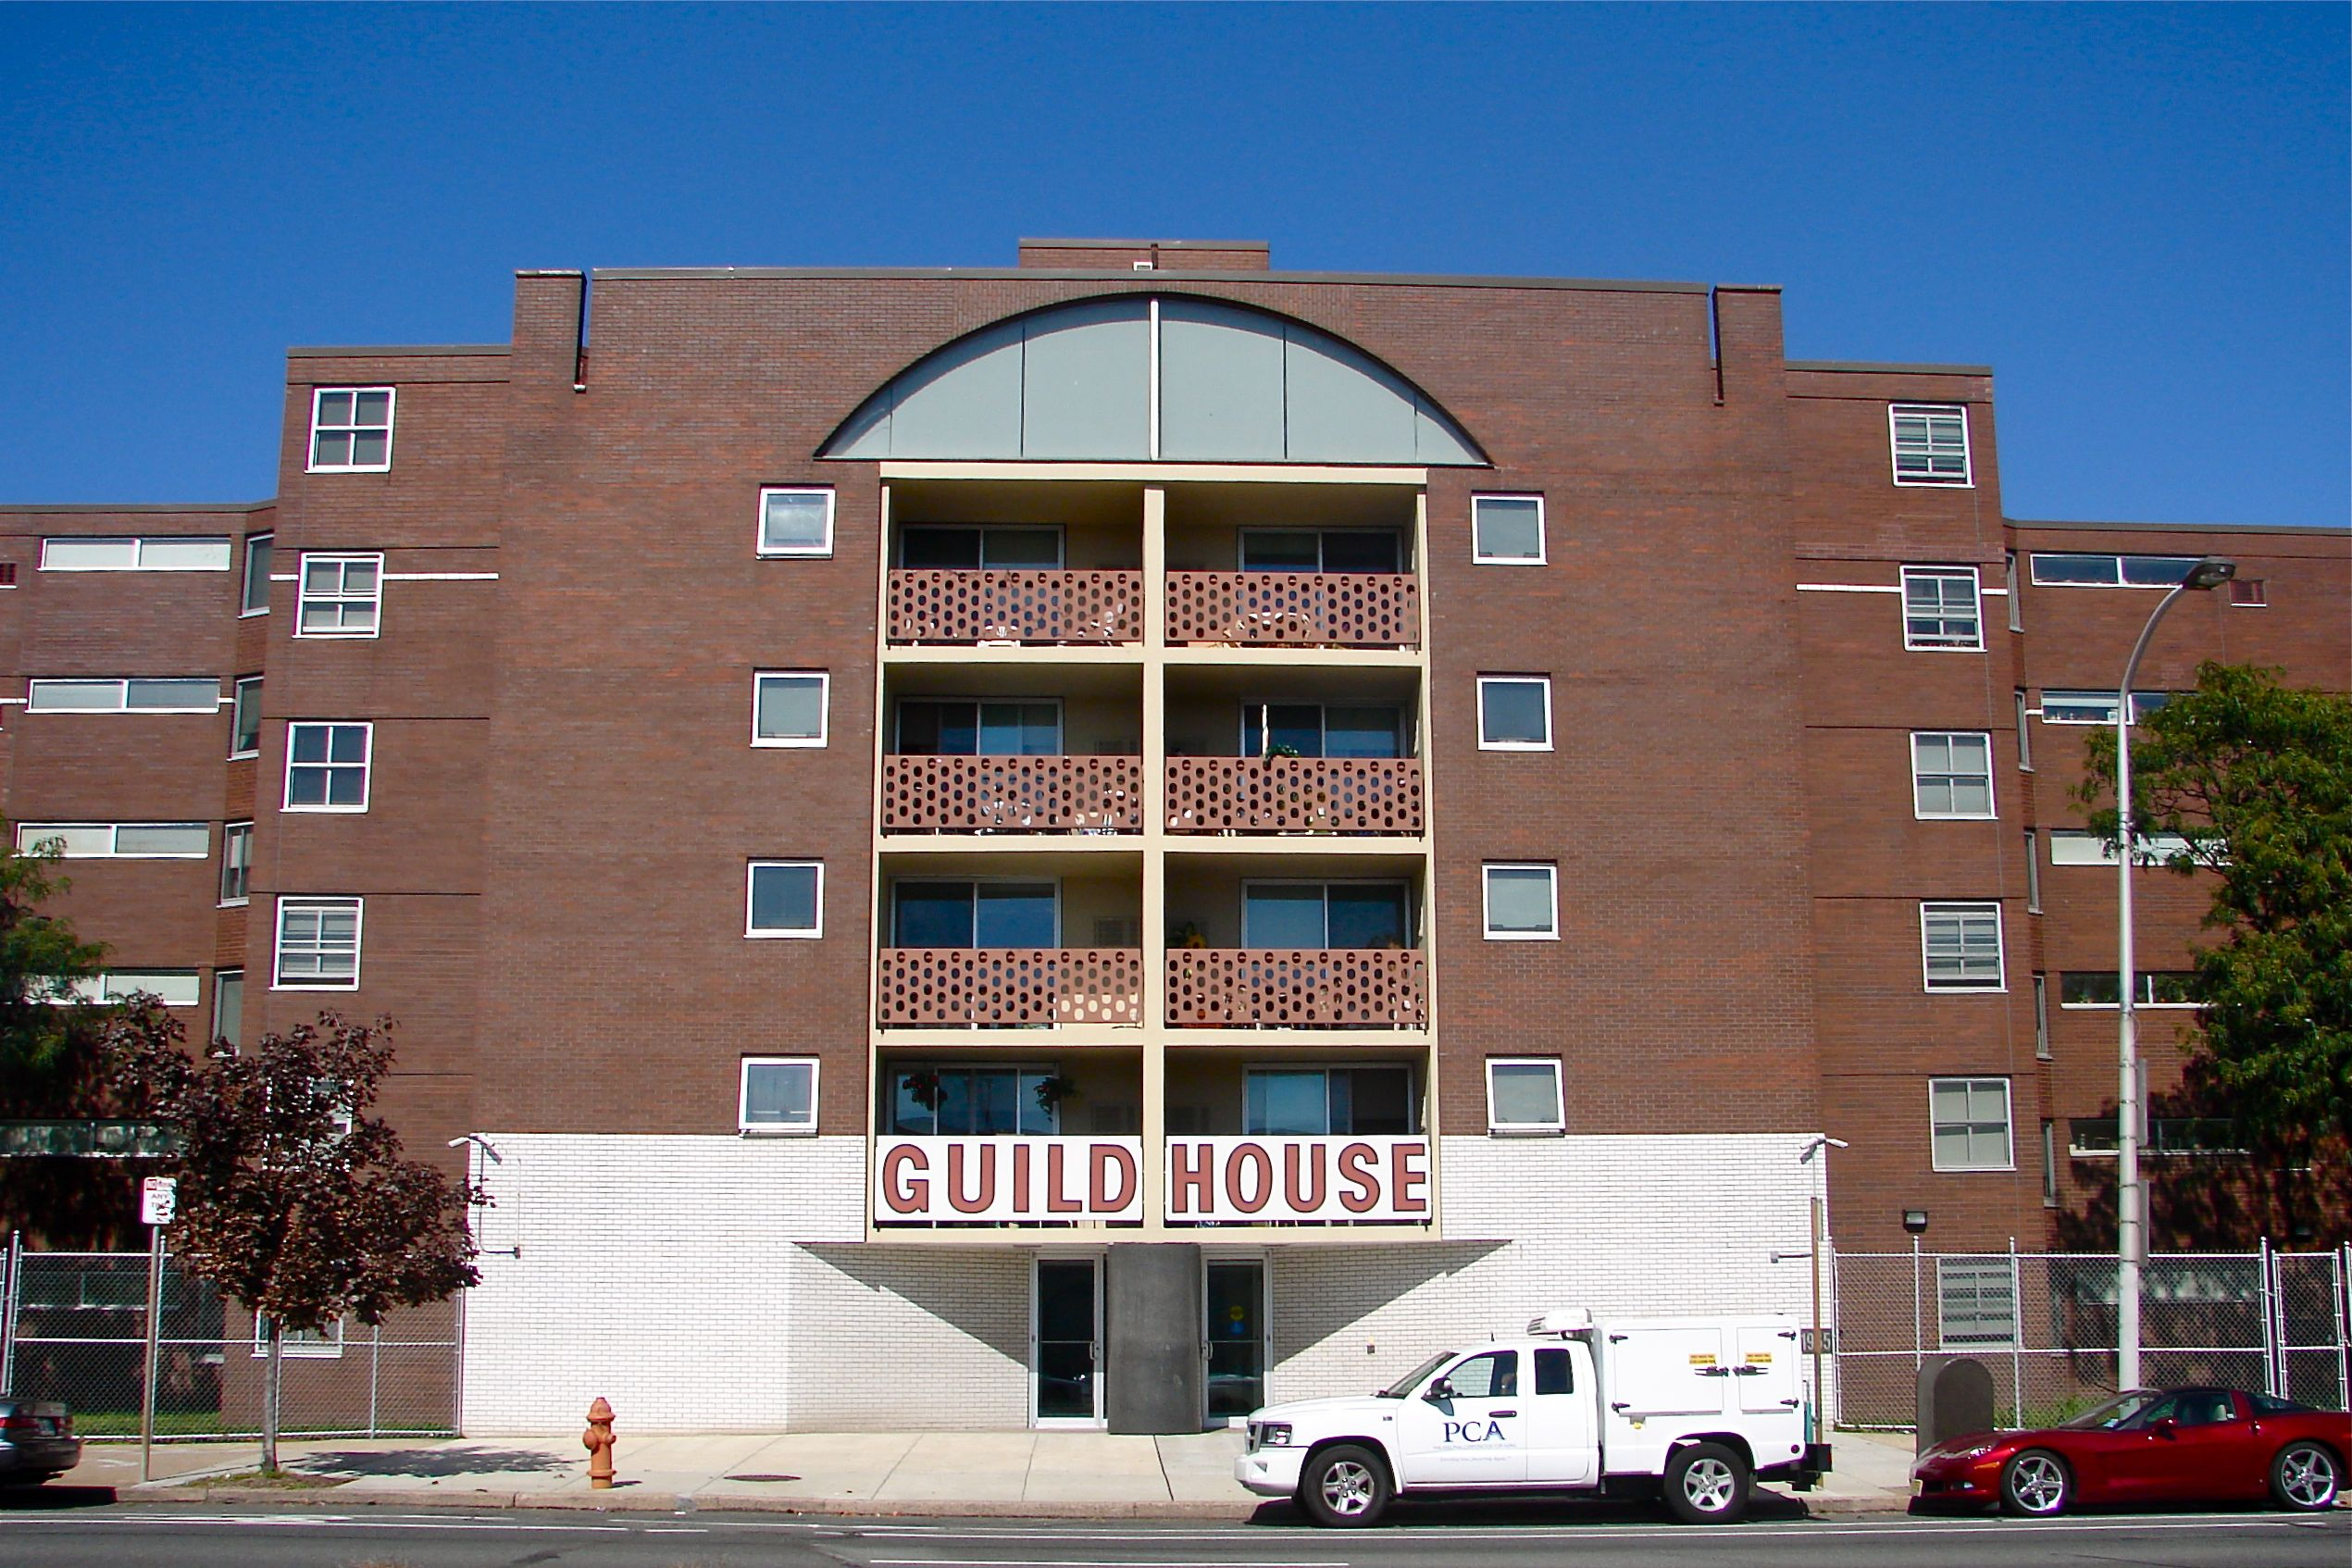 Modern Architecture Encyclopedia guild house (philadelphia) - wikipedia, the free encyclopedia